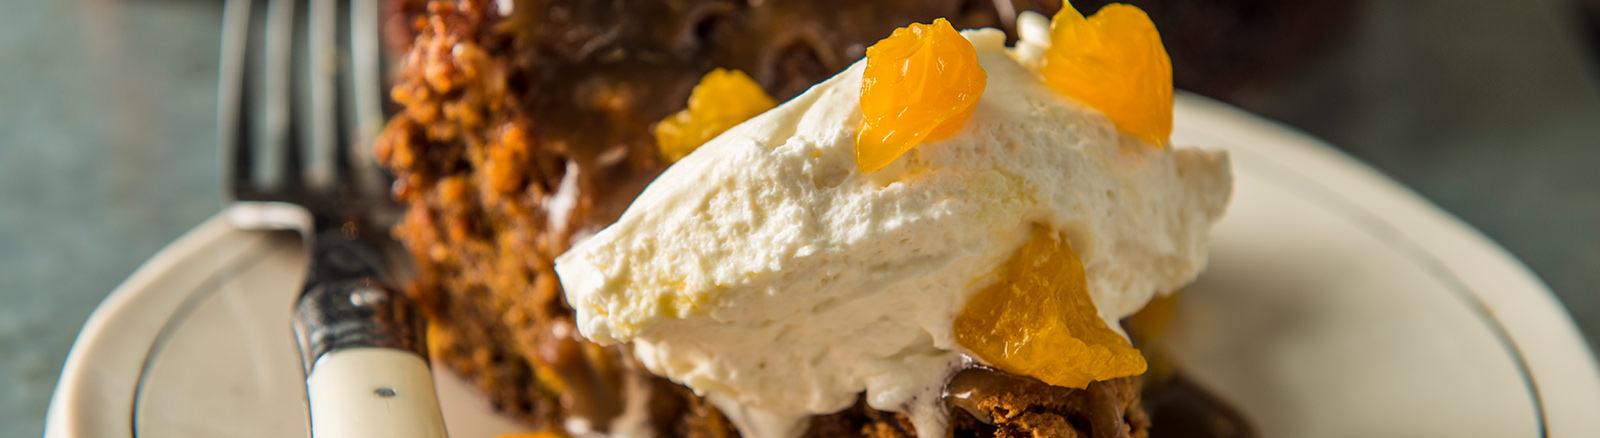 Mandarin Orange Cake With Brown Sugar Glaze